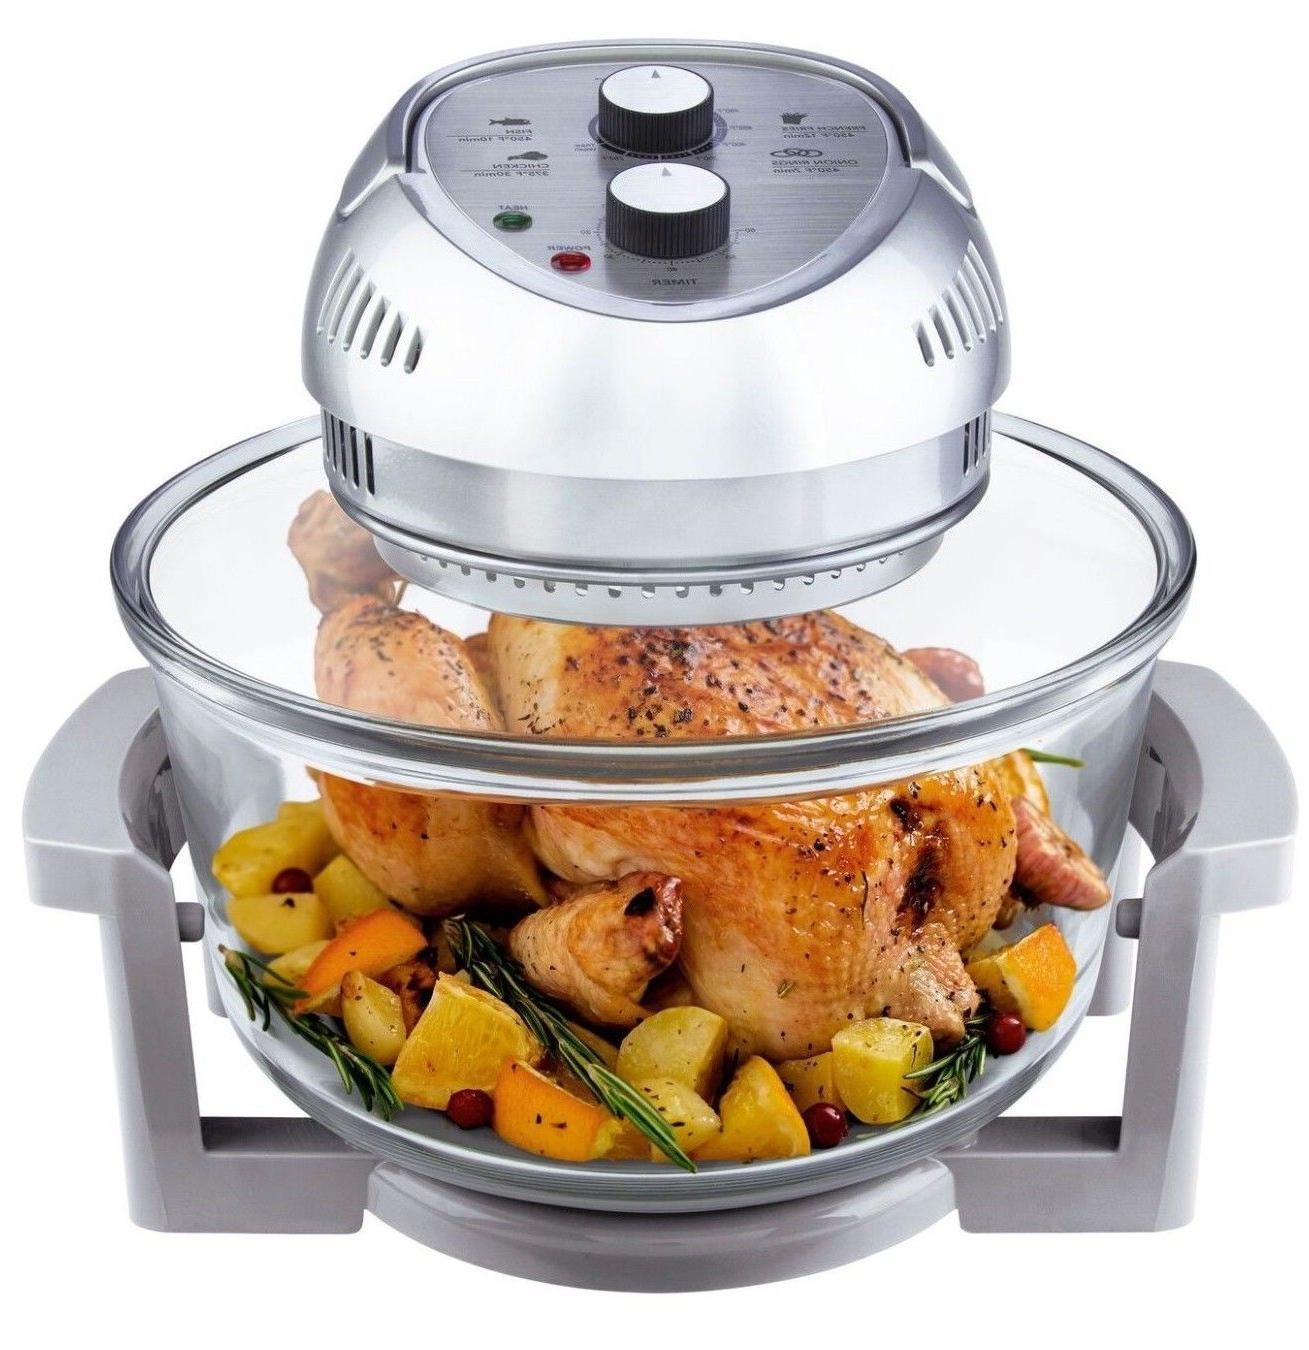 Healthy 1300W + 50 Cookbook, 7